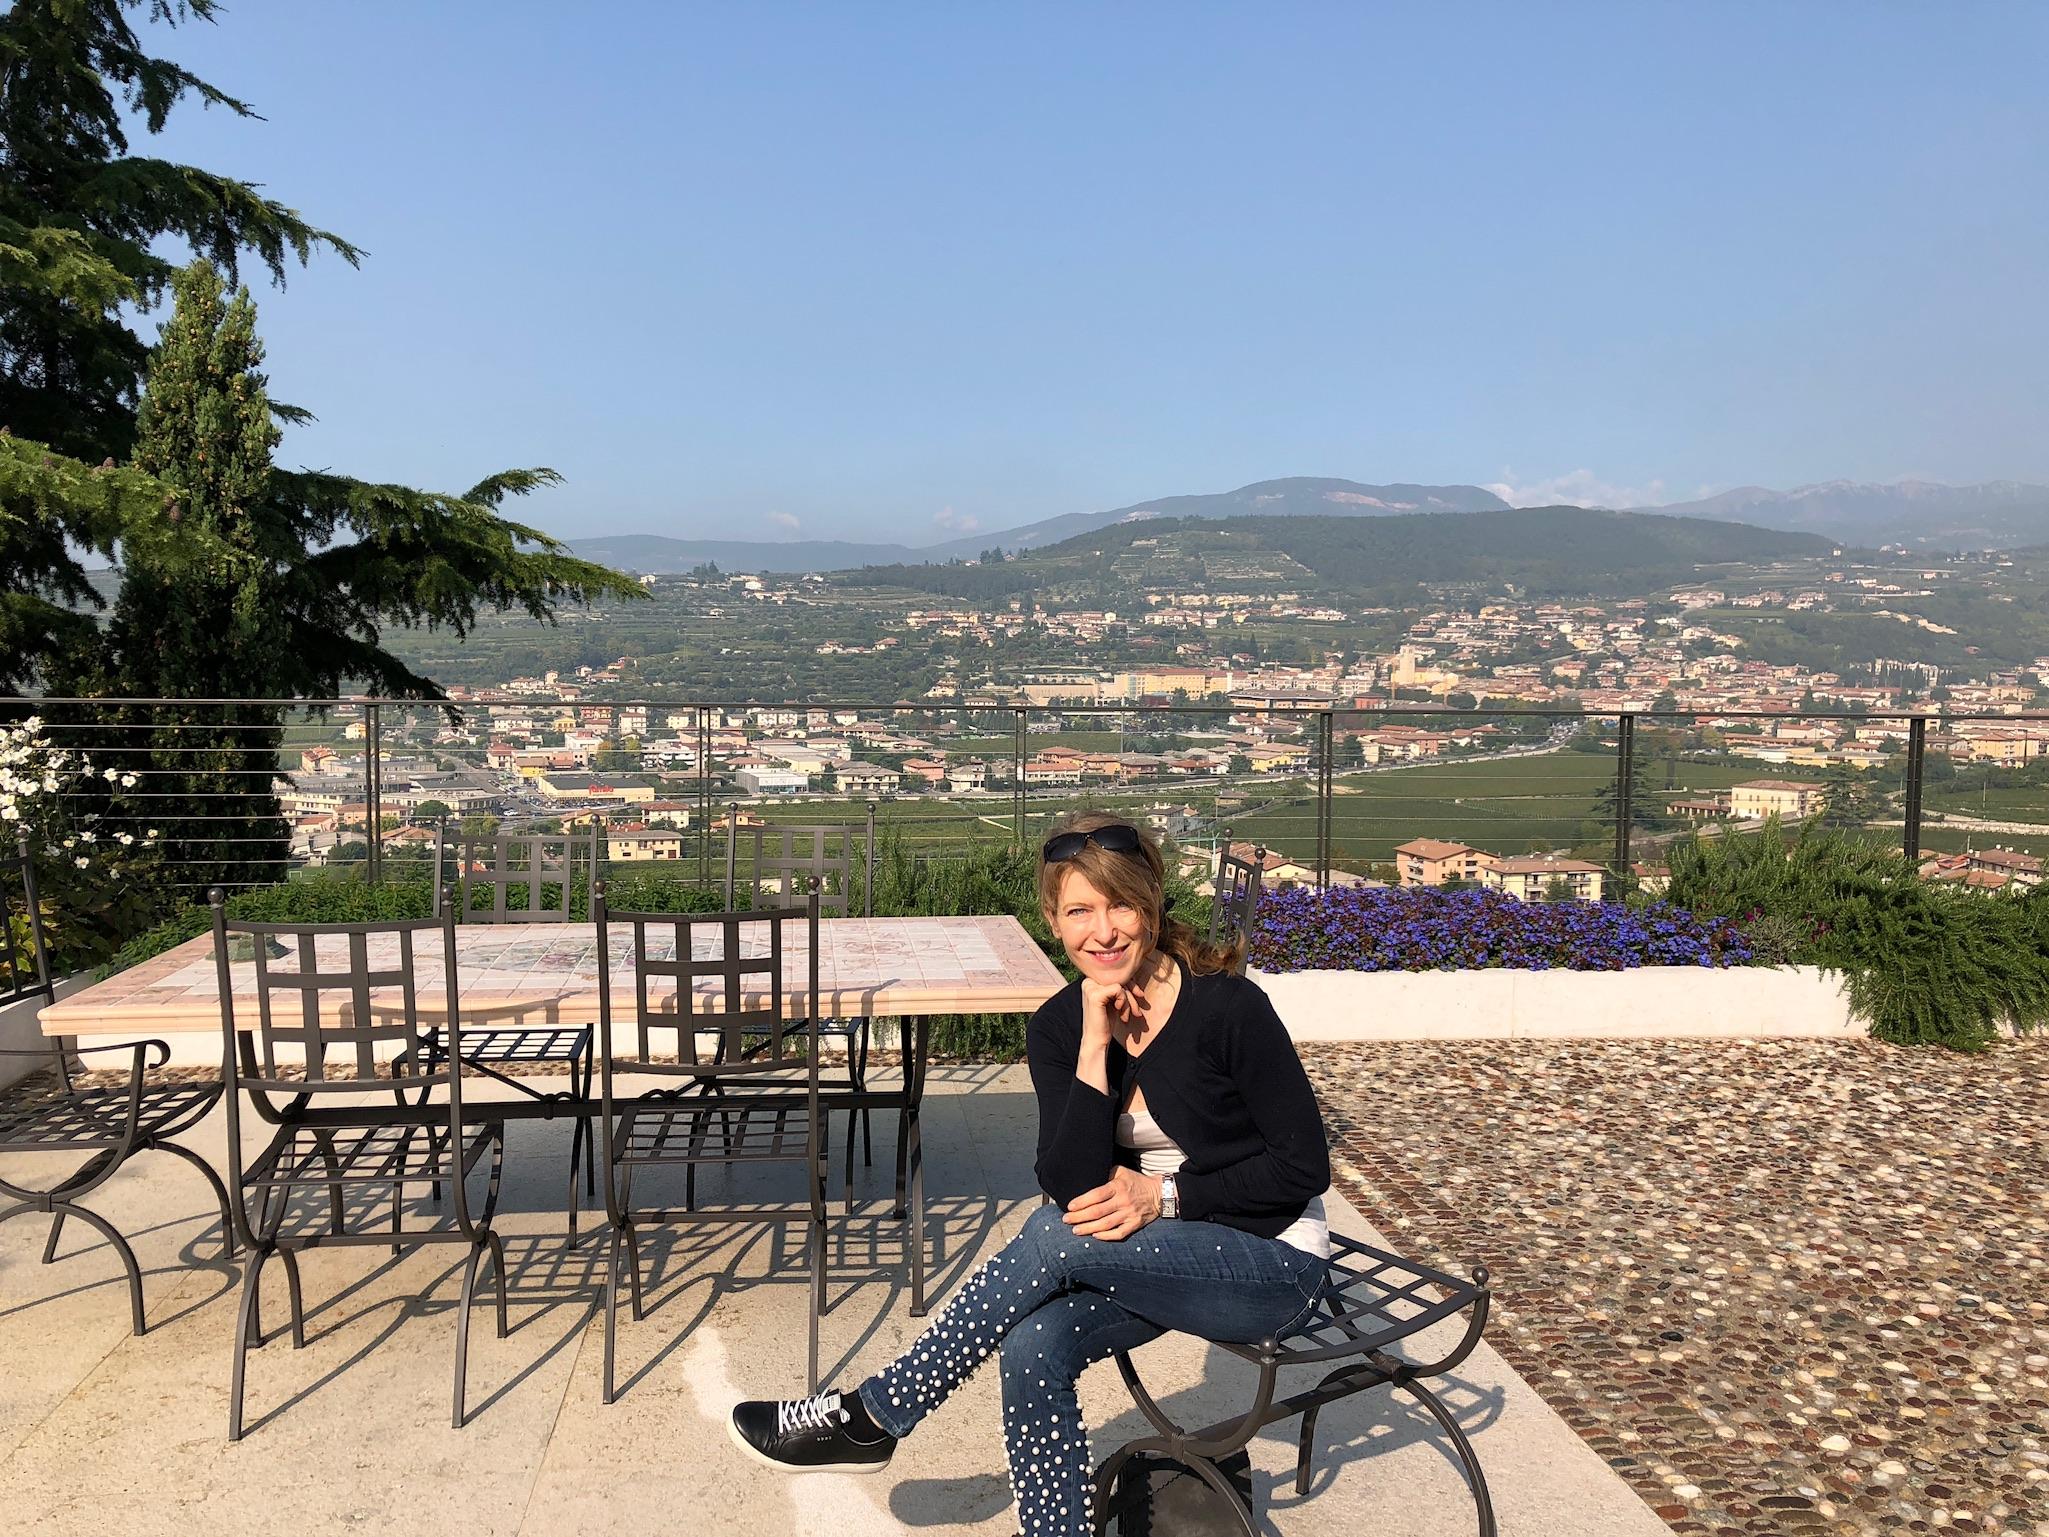 Me, Quintarelli Winery